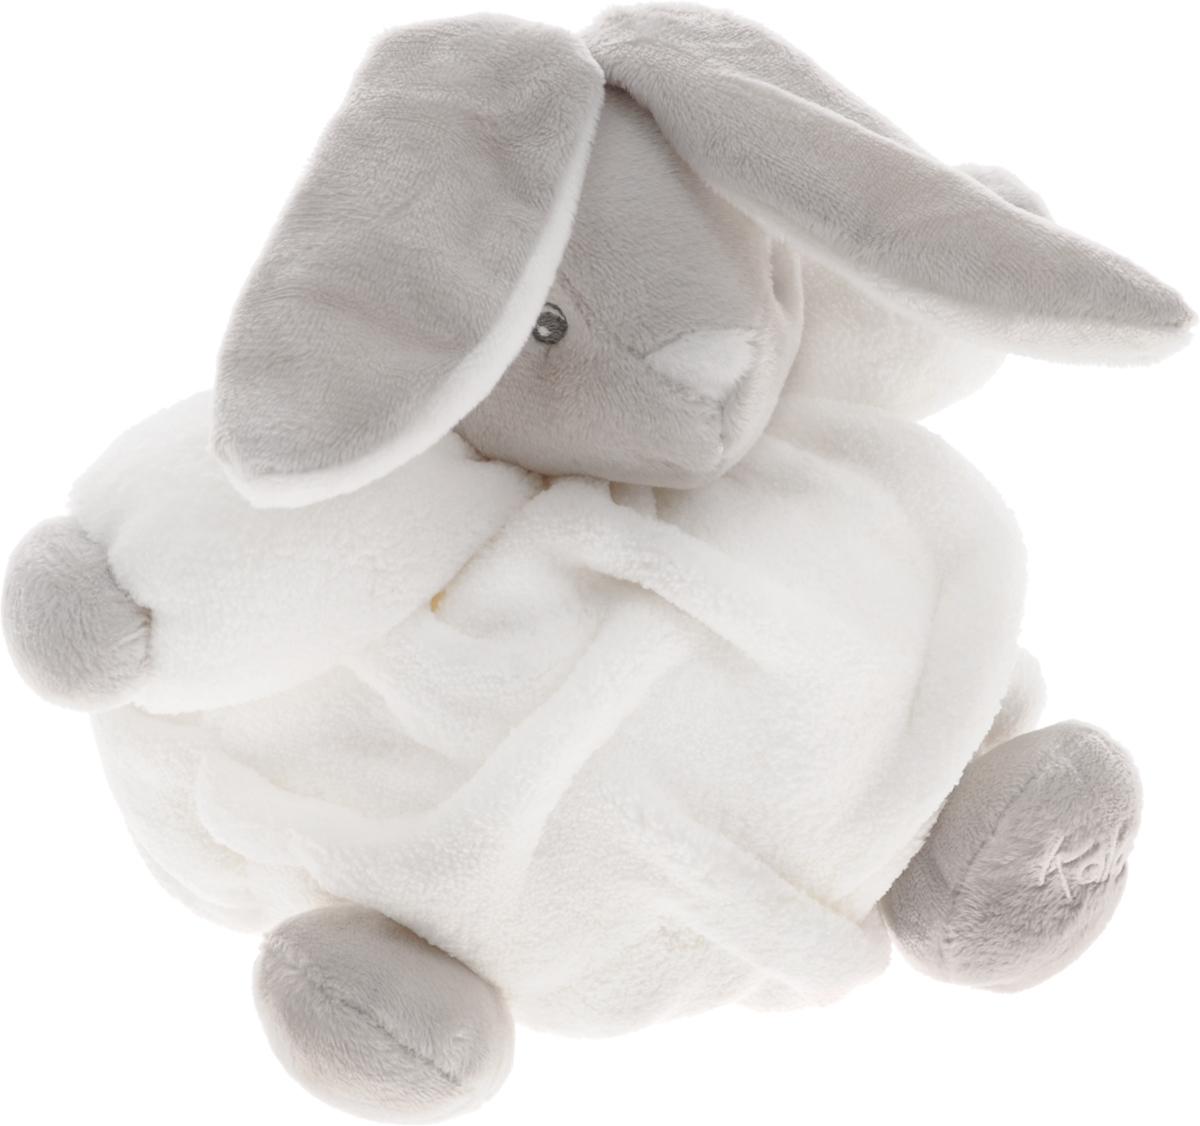 Zakazat.ru: Kaloo Мягкая музыкальная игрушка Заяц цвет белый серый 17 см